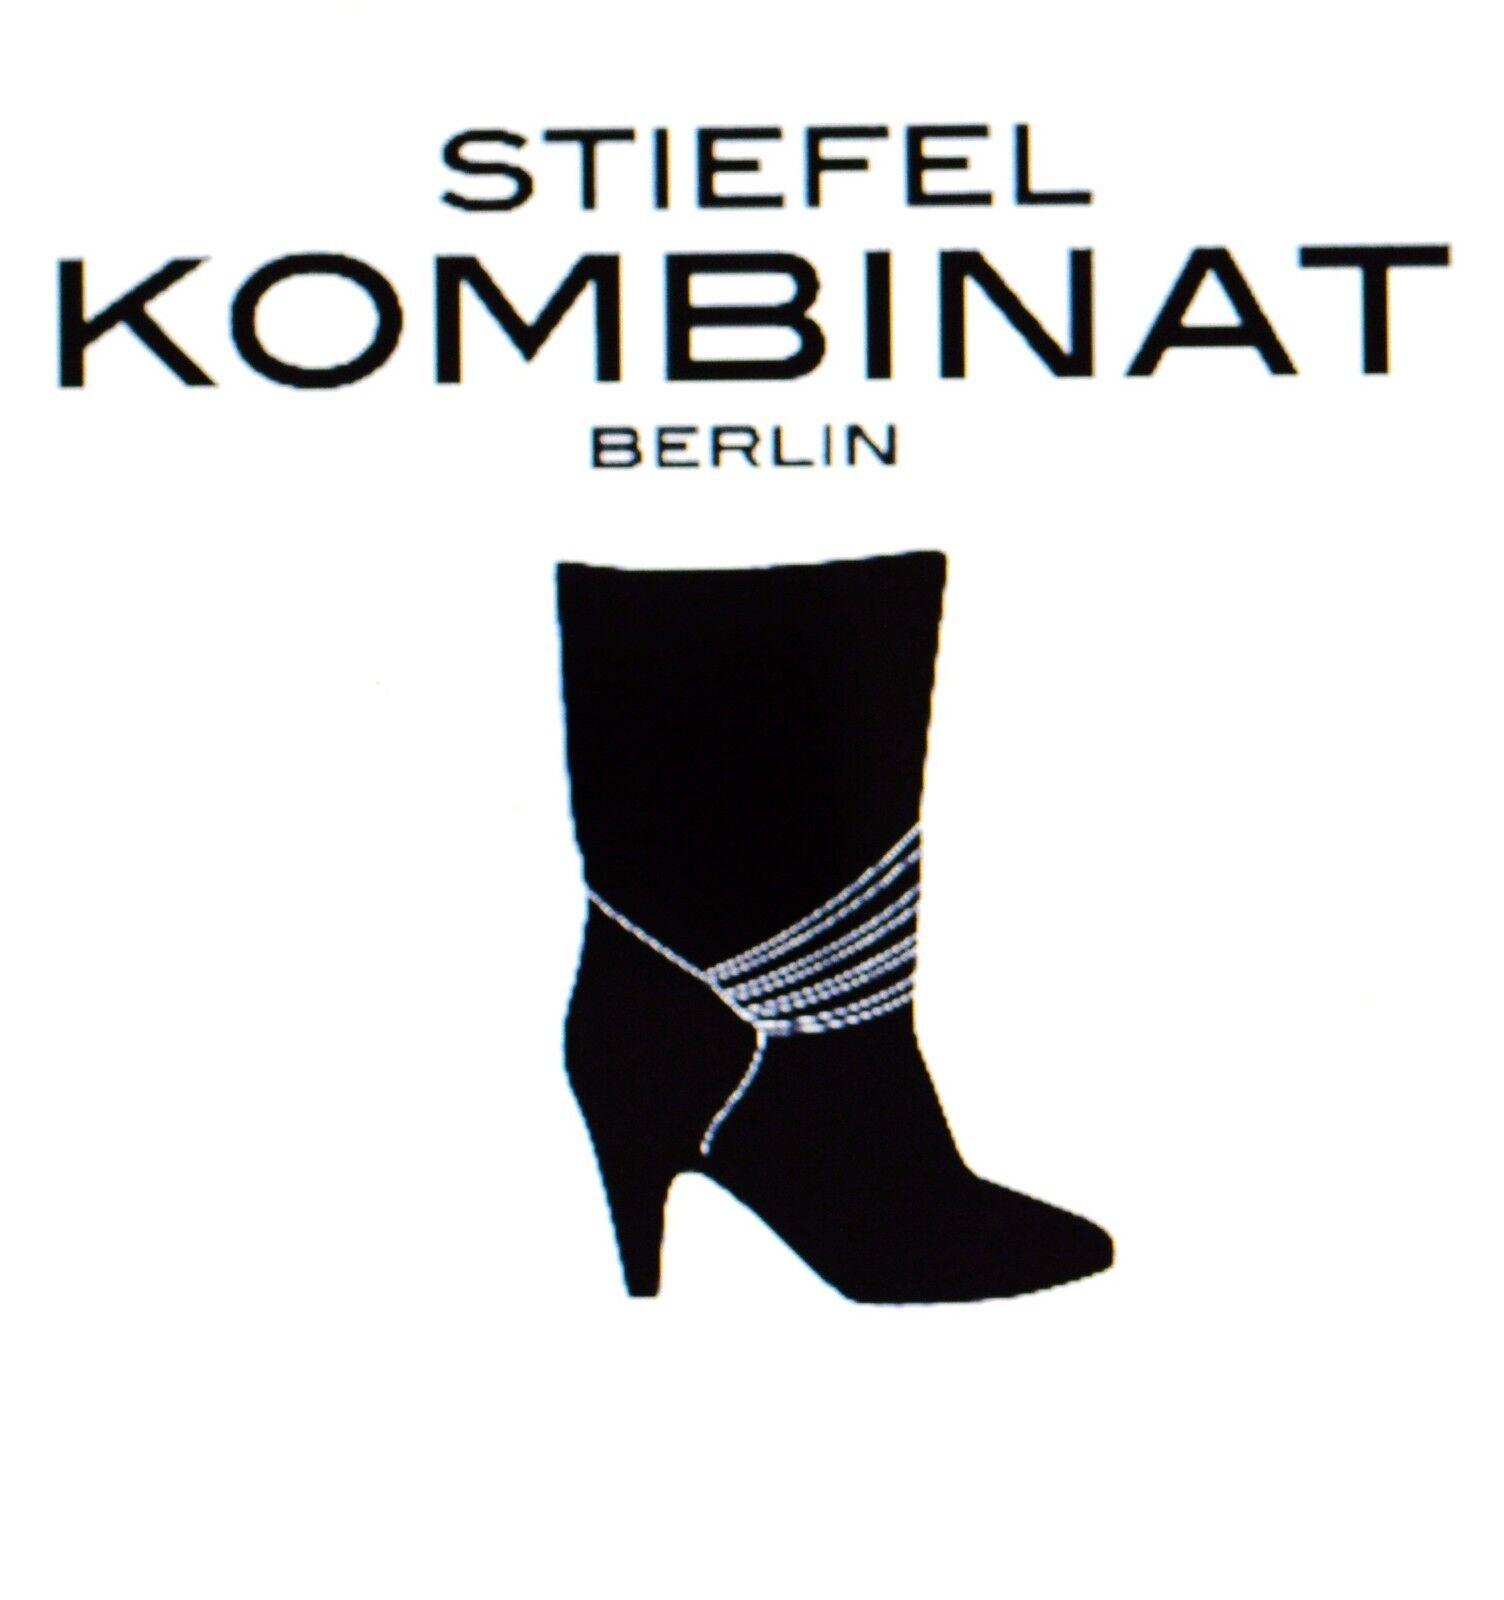 FellStiefel ARKTIS Stiefel Stiefel TRUE TRUE TRUE VINTAGE Fell Winterstiefel uk7,5 YetiStiefel d3174b